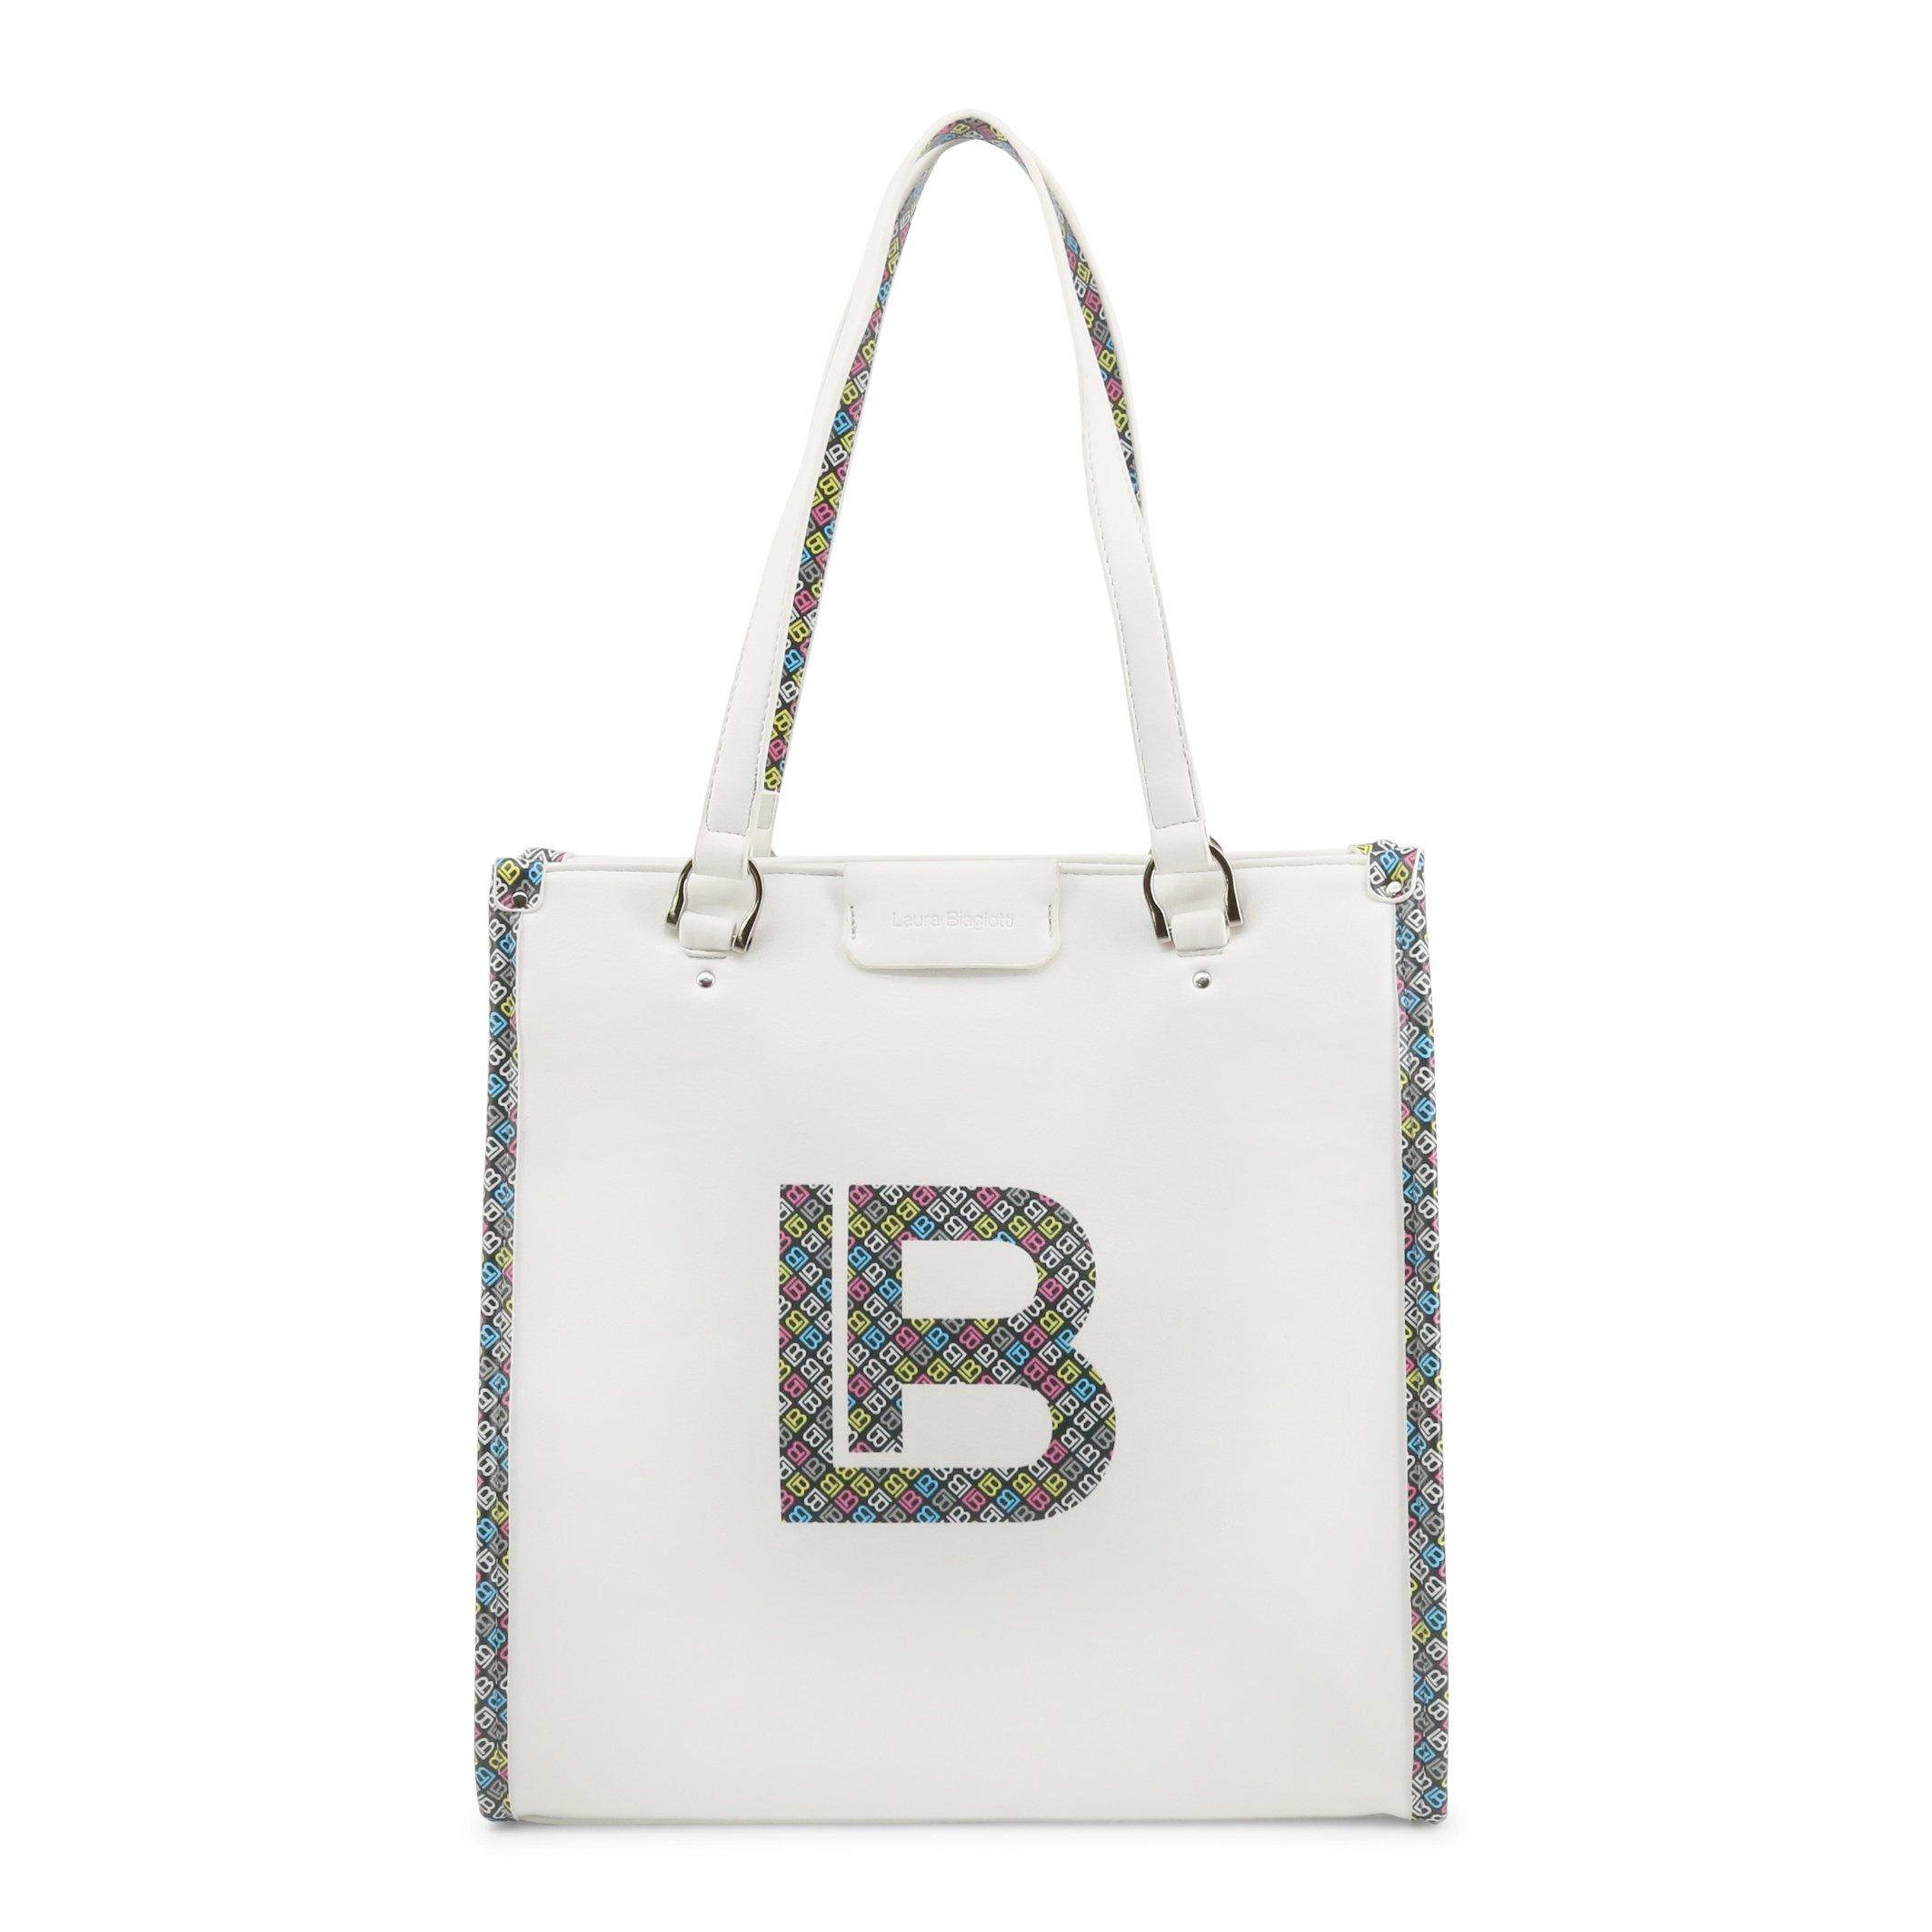 Laura Biagiotti Women's Shoulder Bag Various Colours Milla_108-1 - white NOSIZE